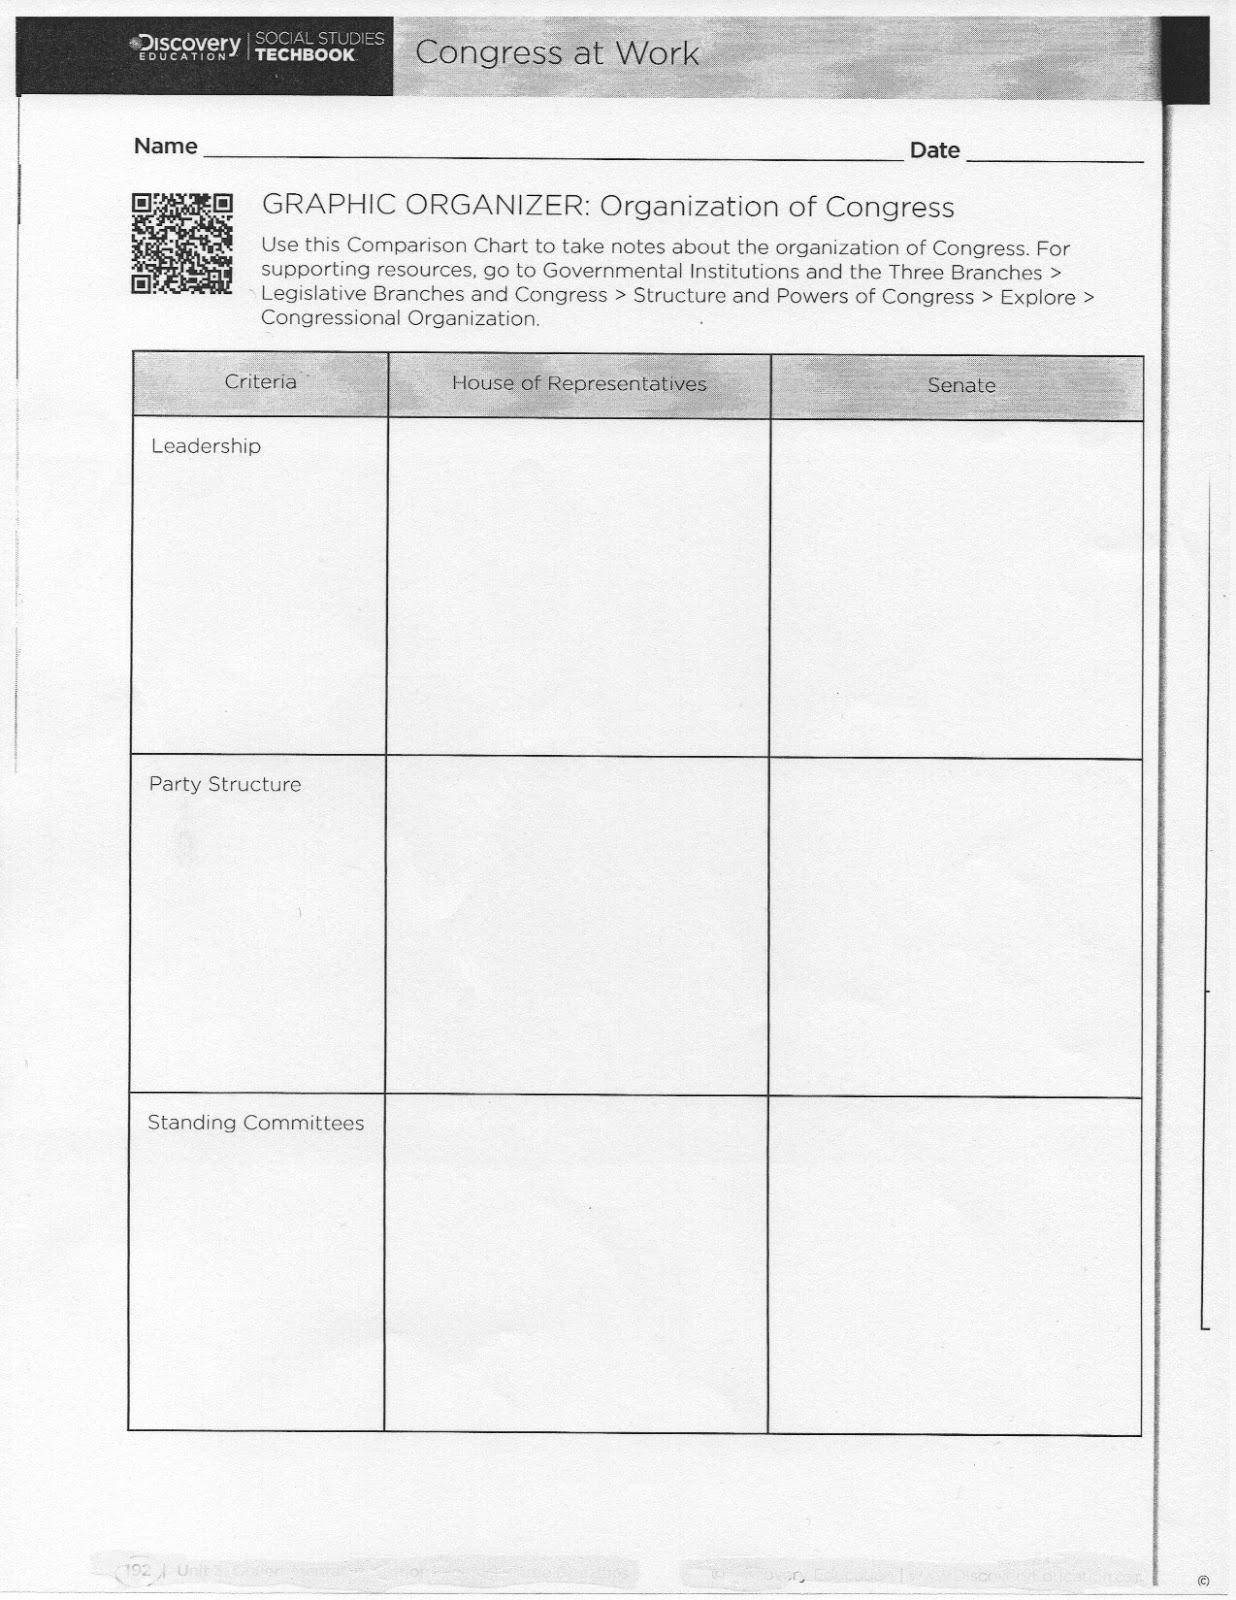 Coach Green S Class Unit 10 Worksheets